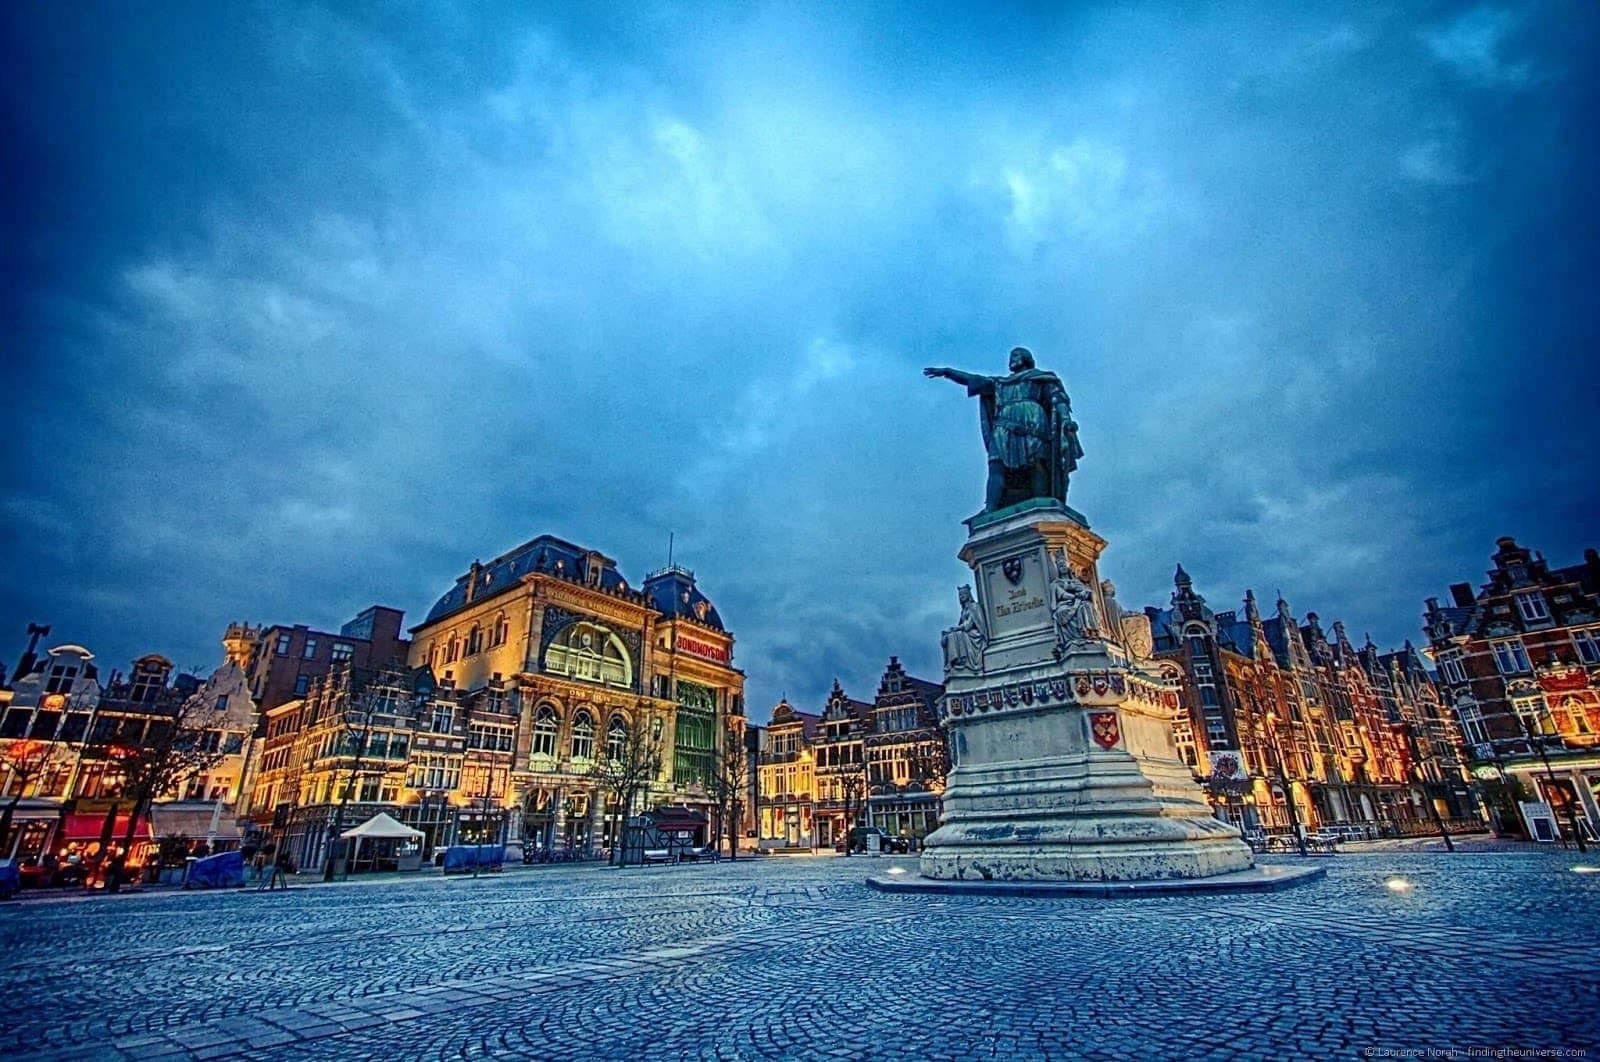 Statue in Ghent